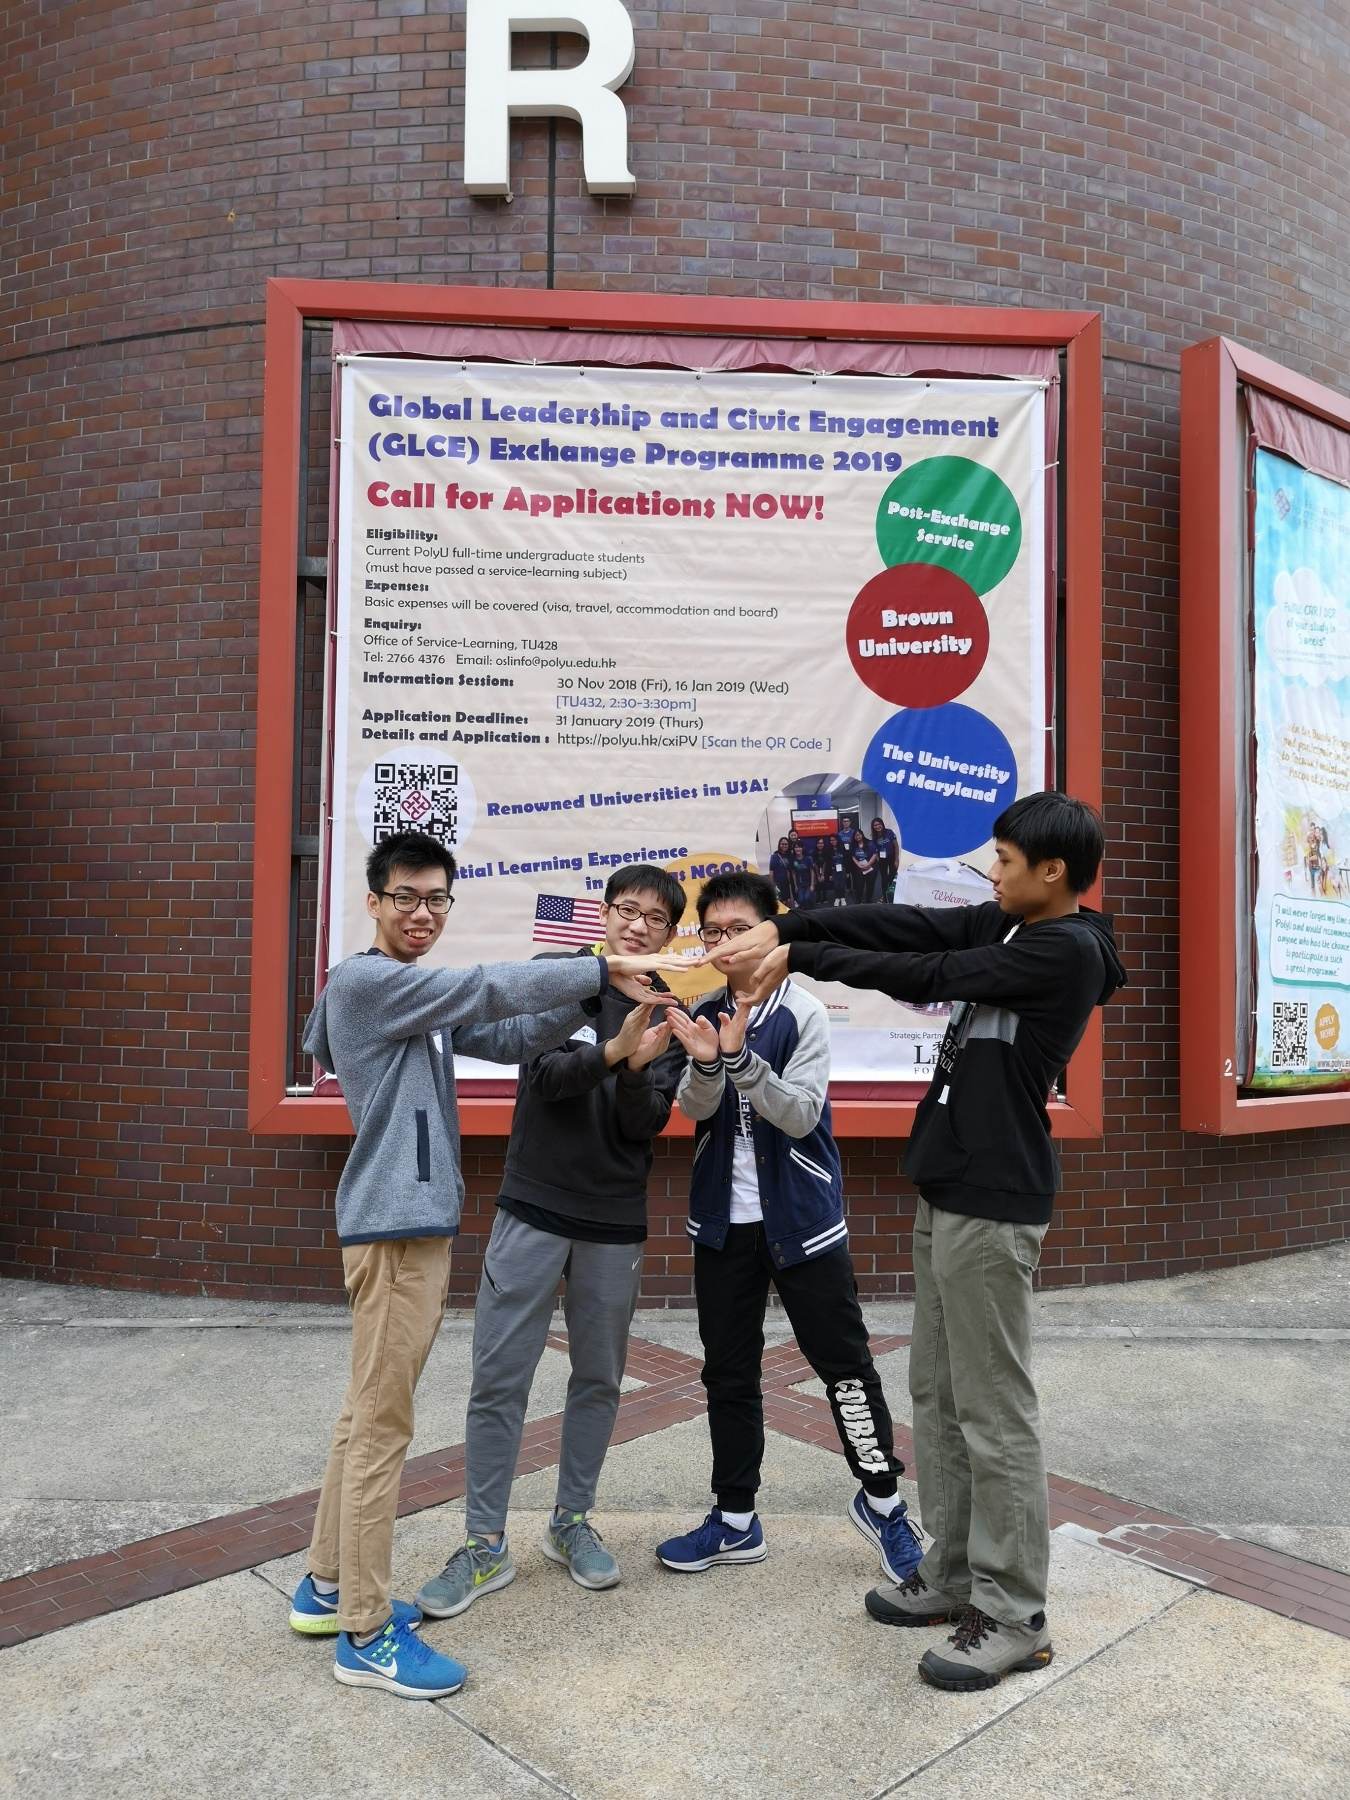 http://npc.edu.hk/sites/default/files/img_20190126_102852_resized_20190201_051213260.jpg